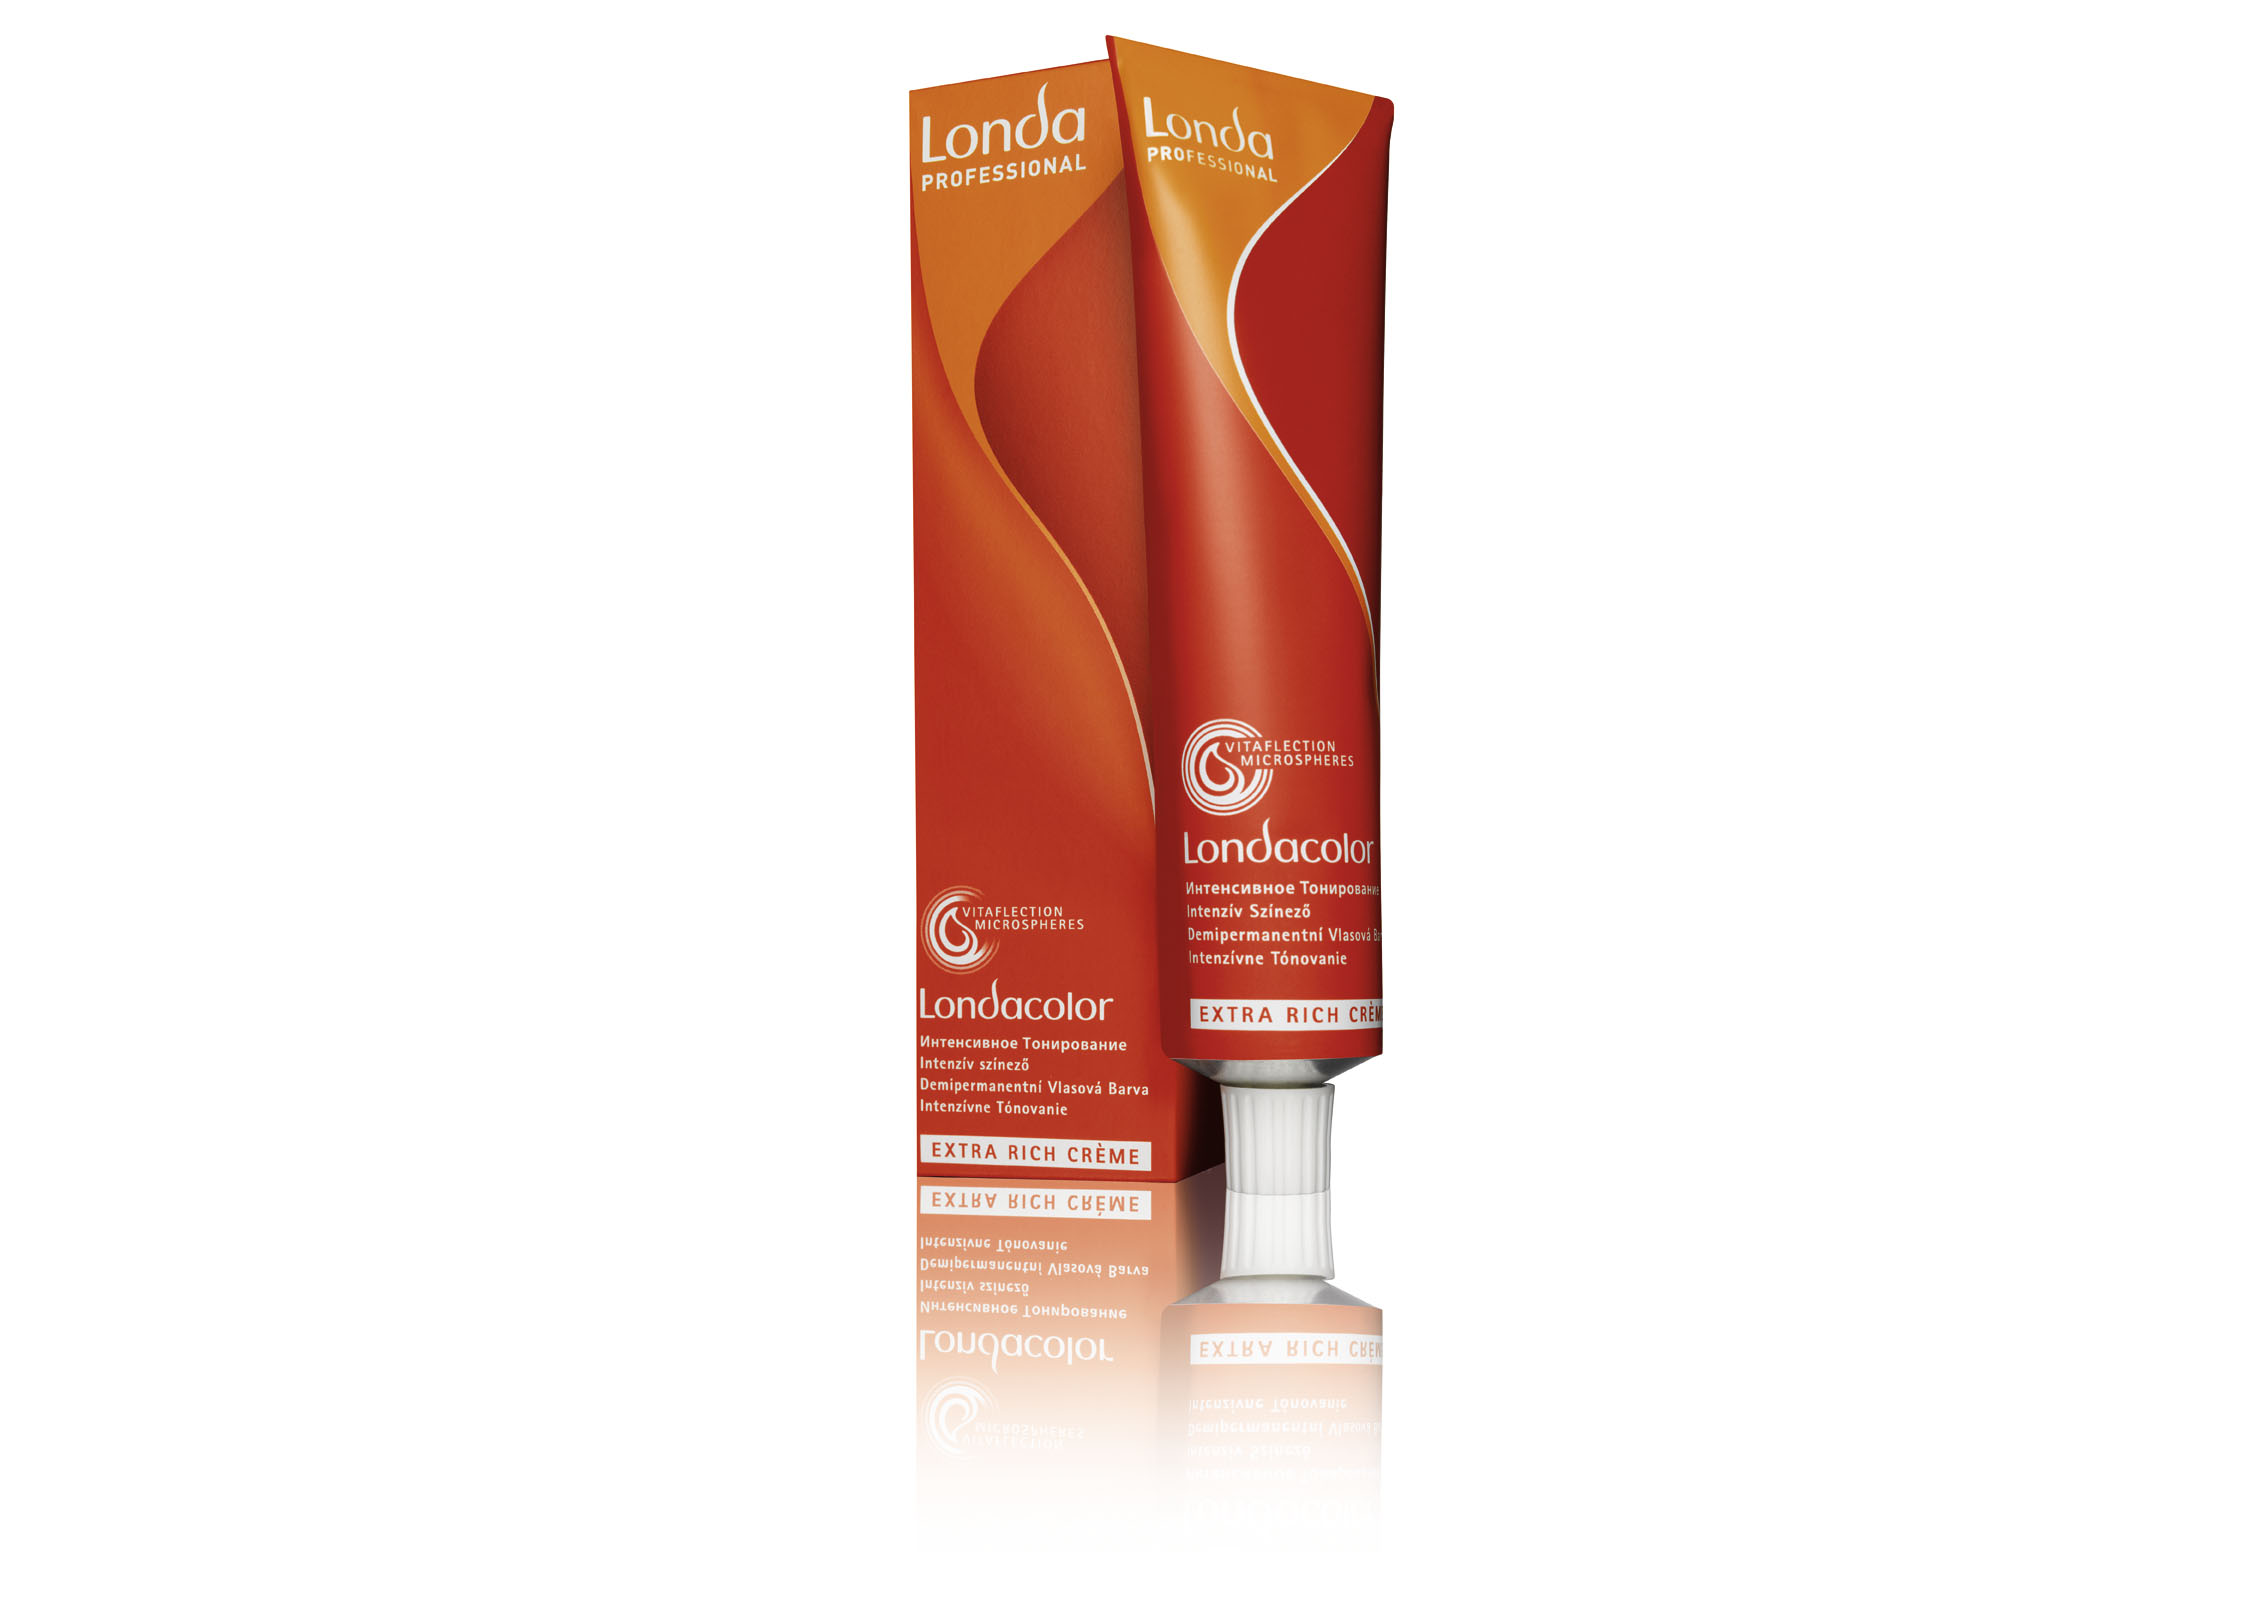 Londa Londacolor Intensivtönung 60 ml